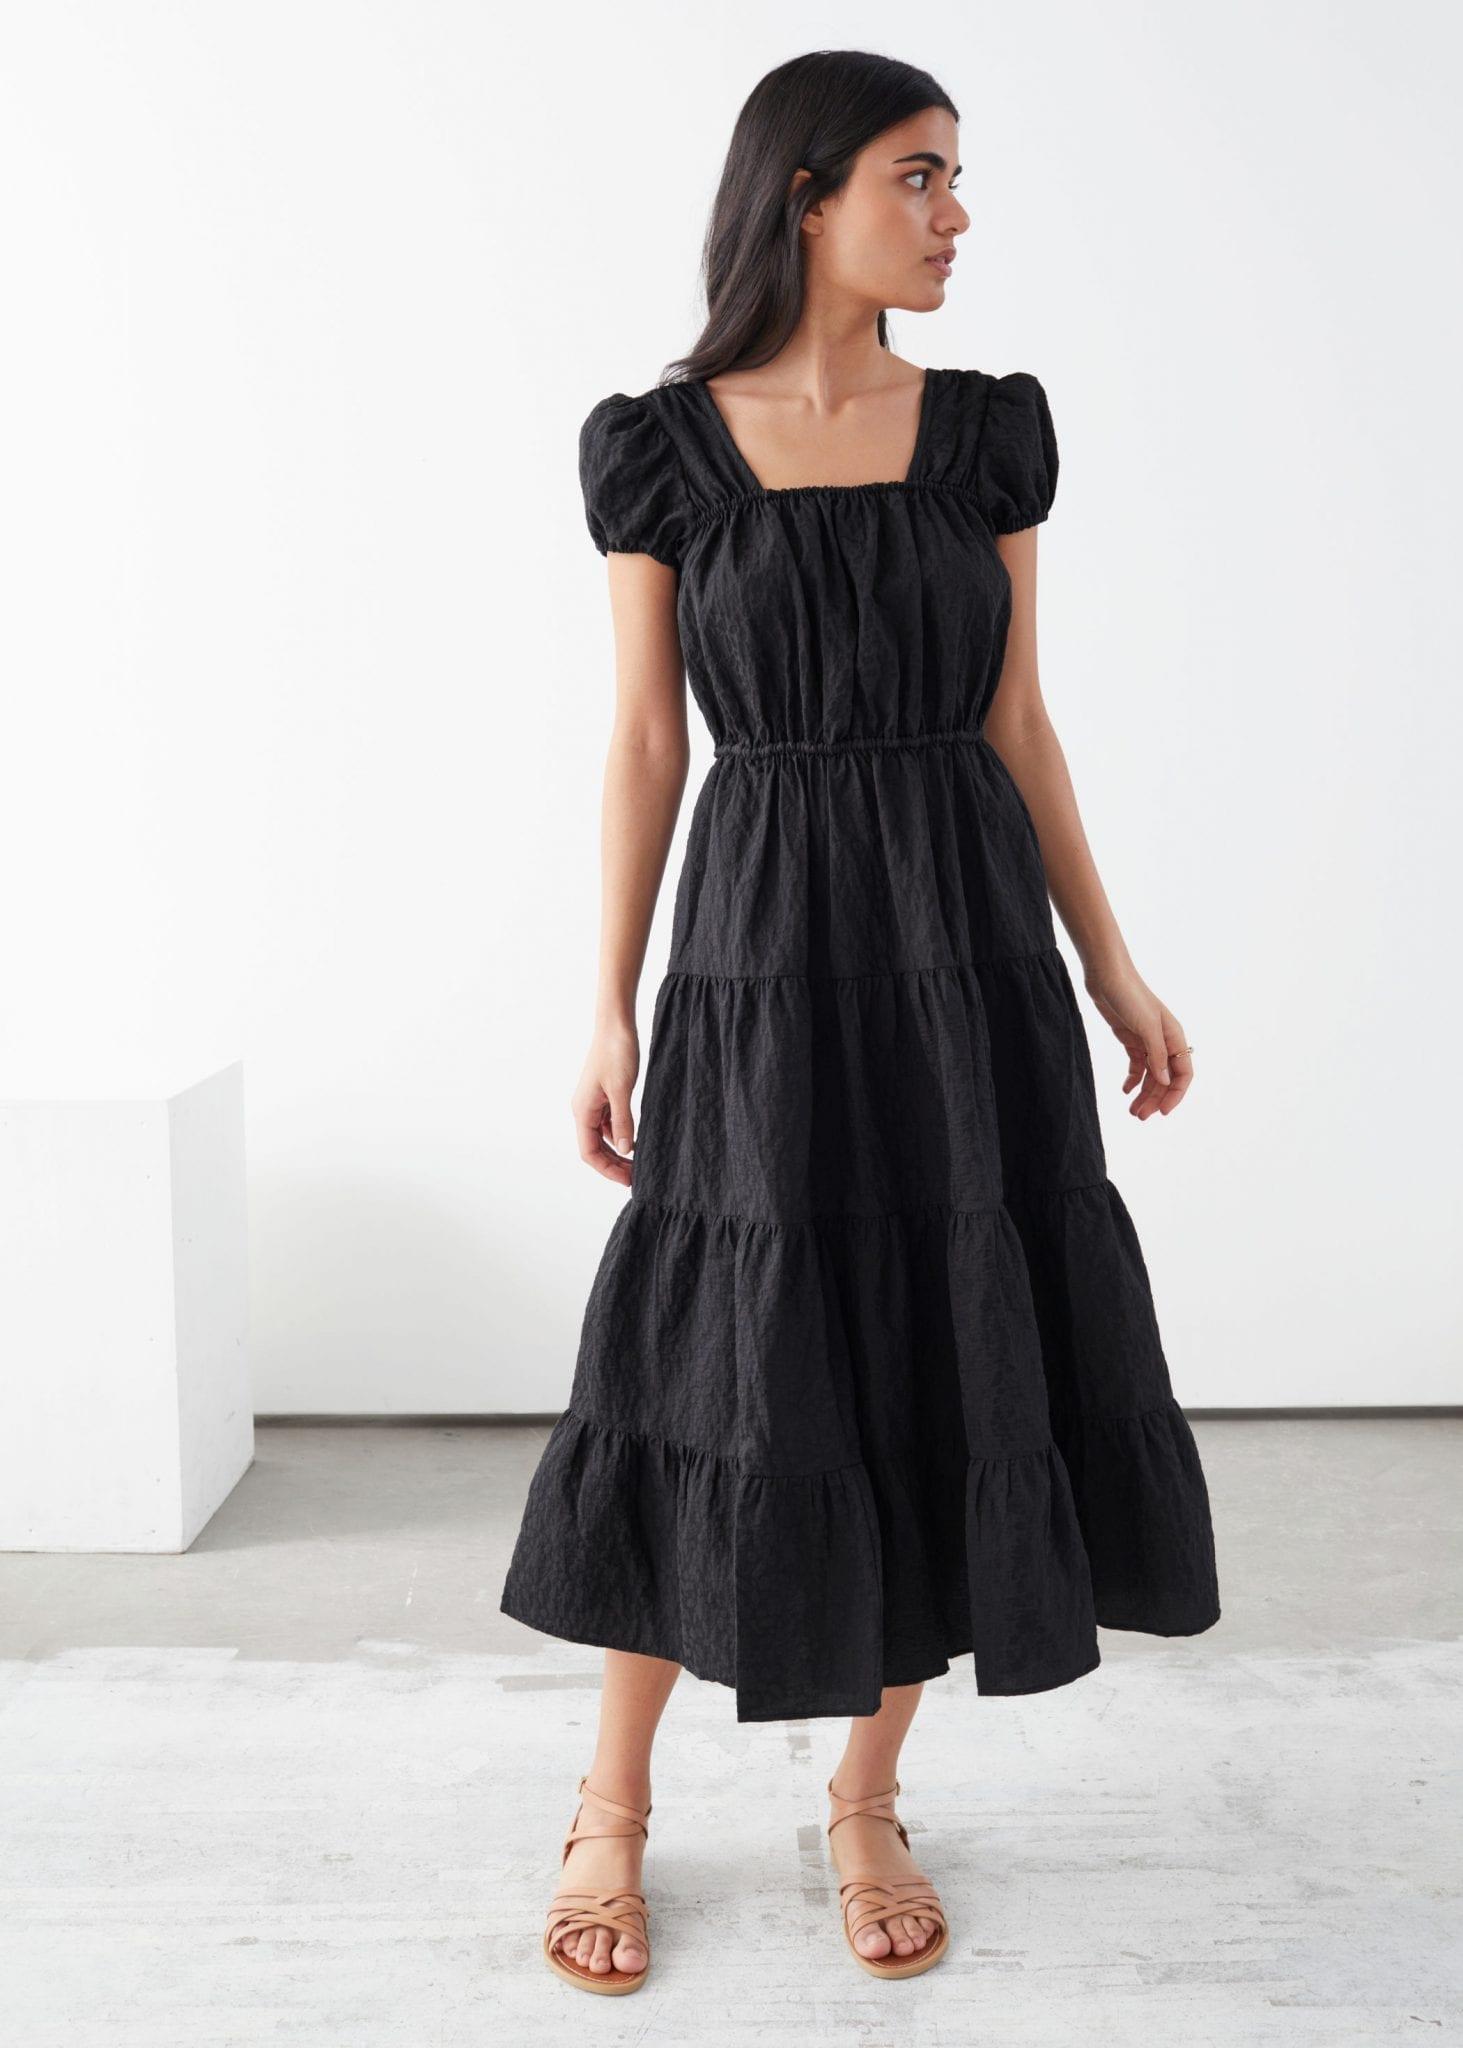 & OTHER STORIES A-Line Jacquard Ruffle Midi Dress